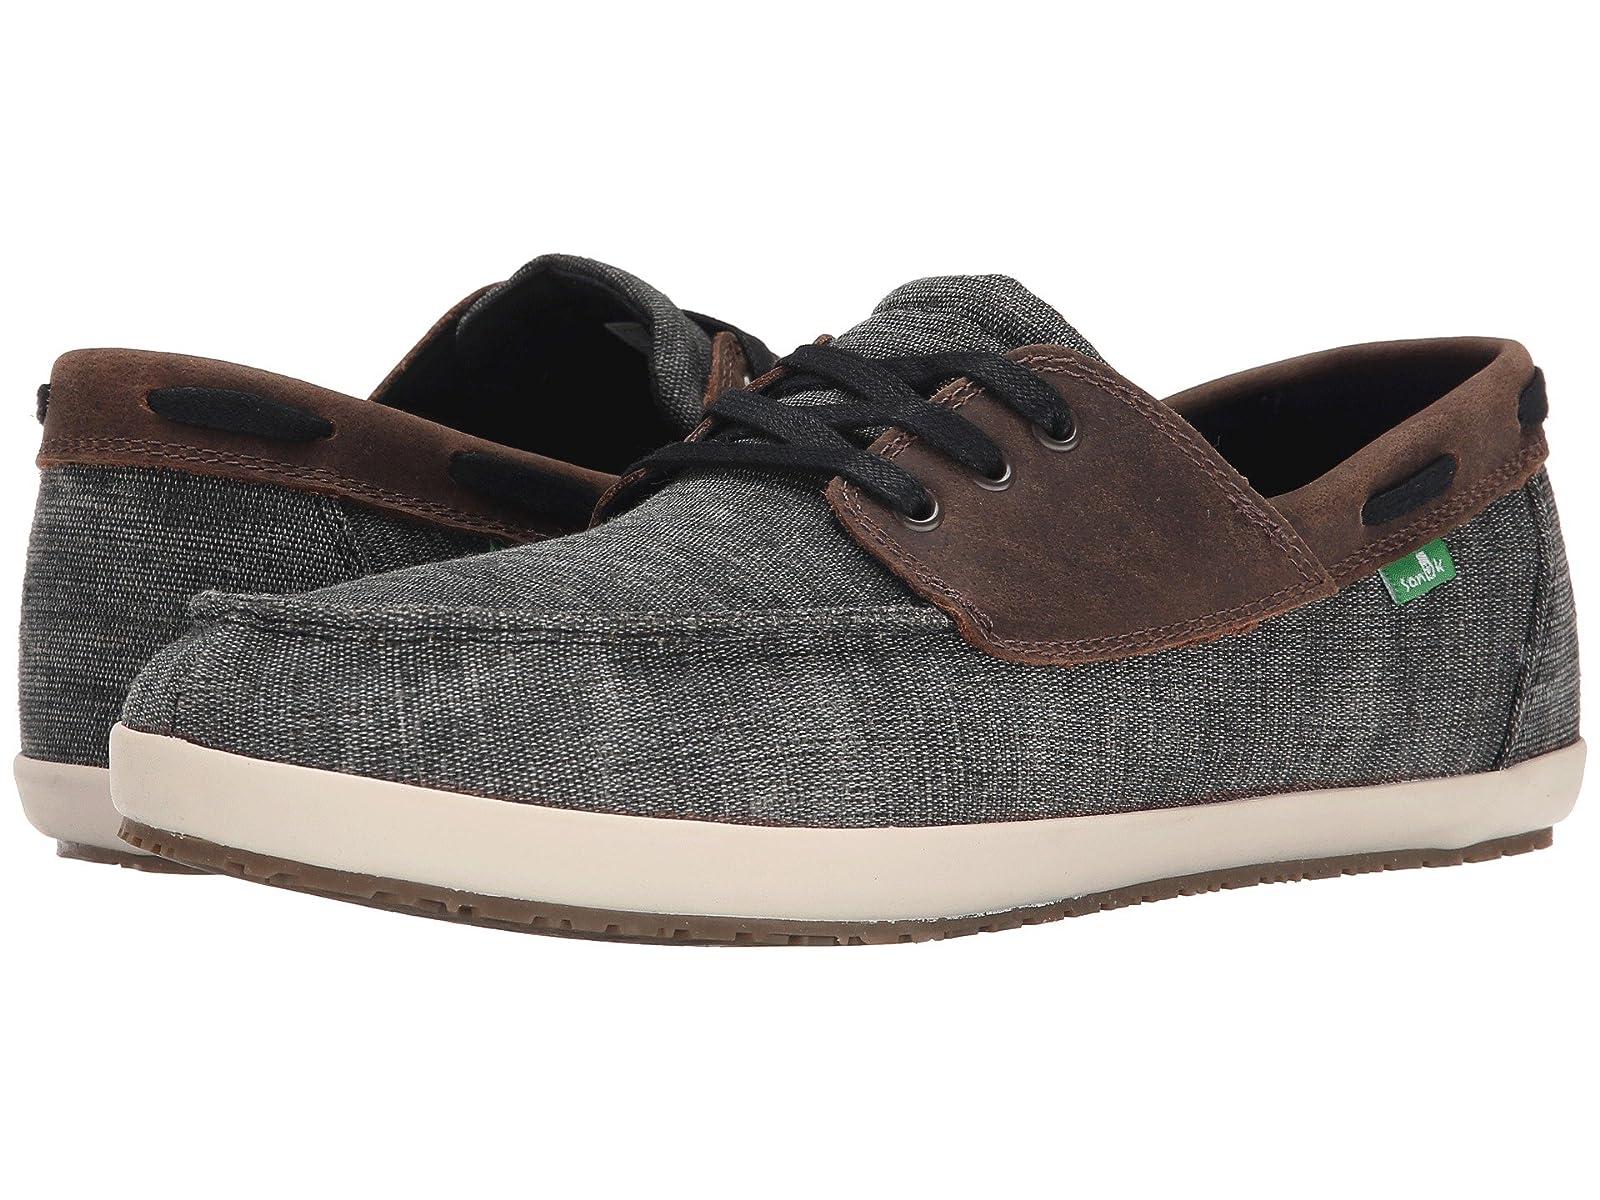 Sanuk Casa Barco VintageCheap and distinctive eye-catching shoes